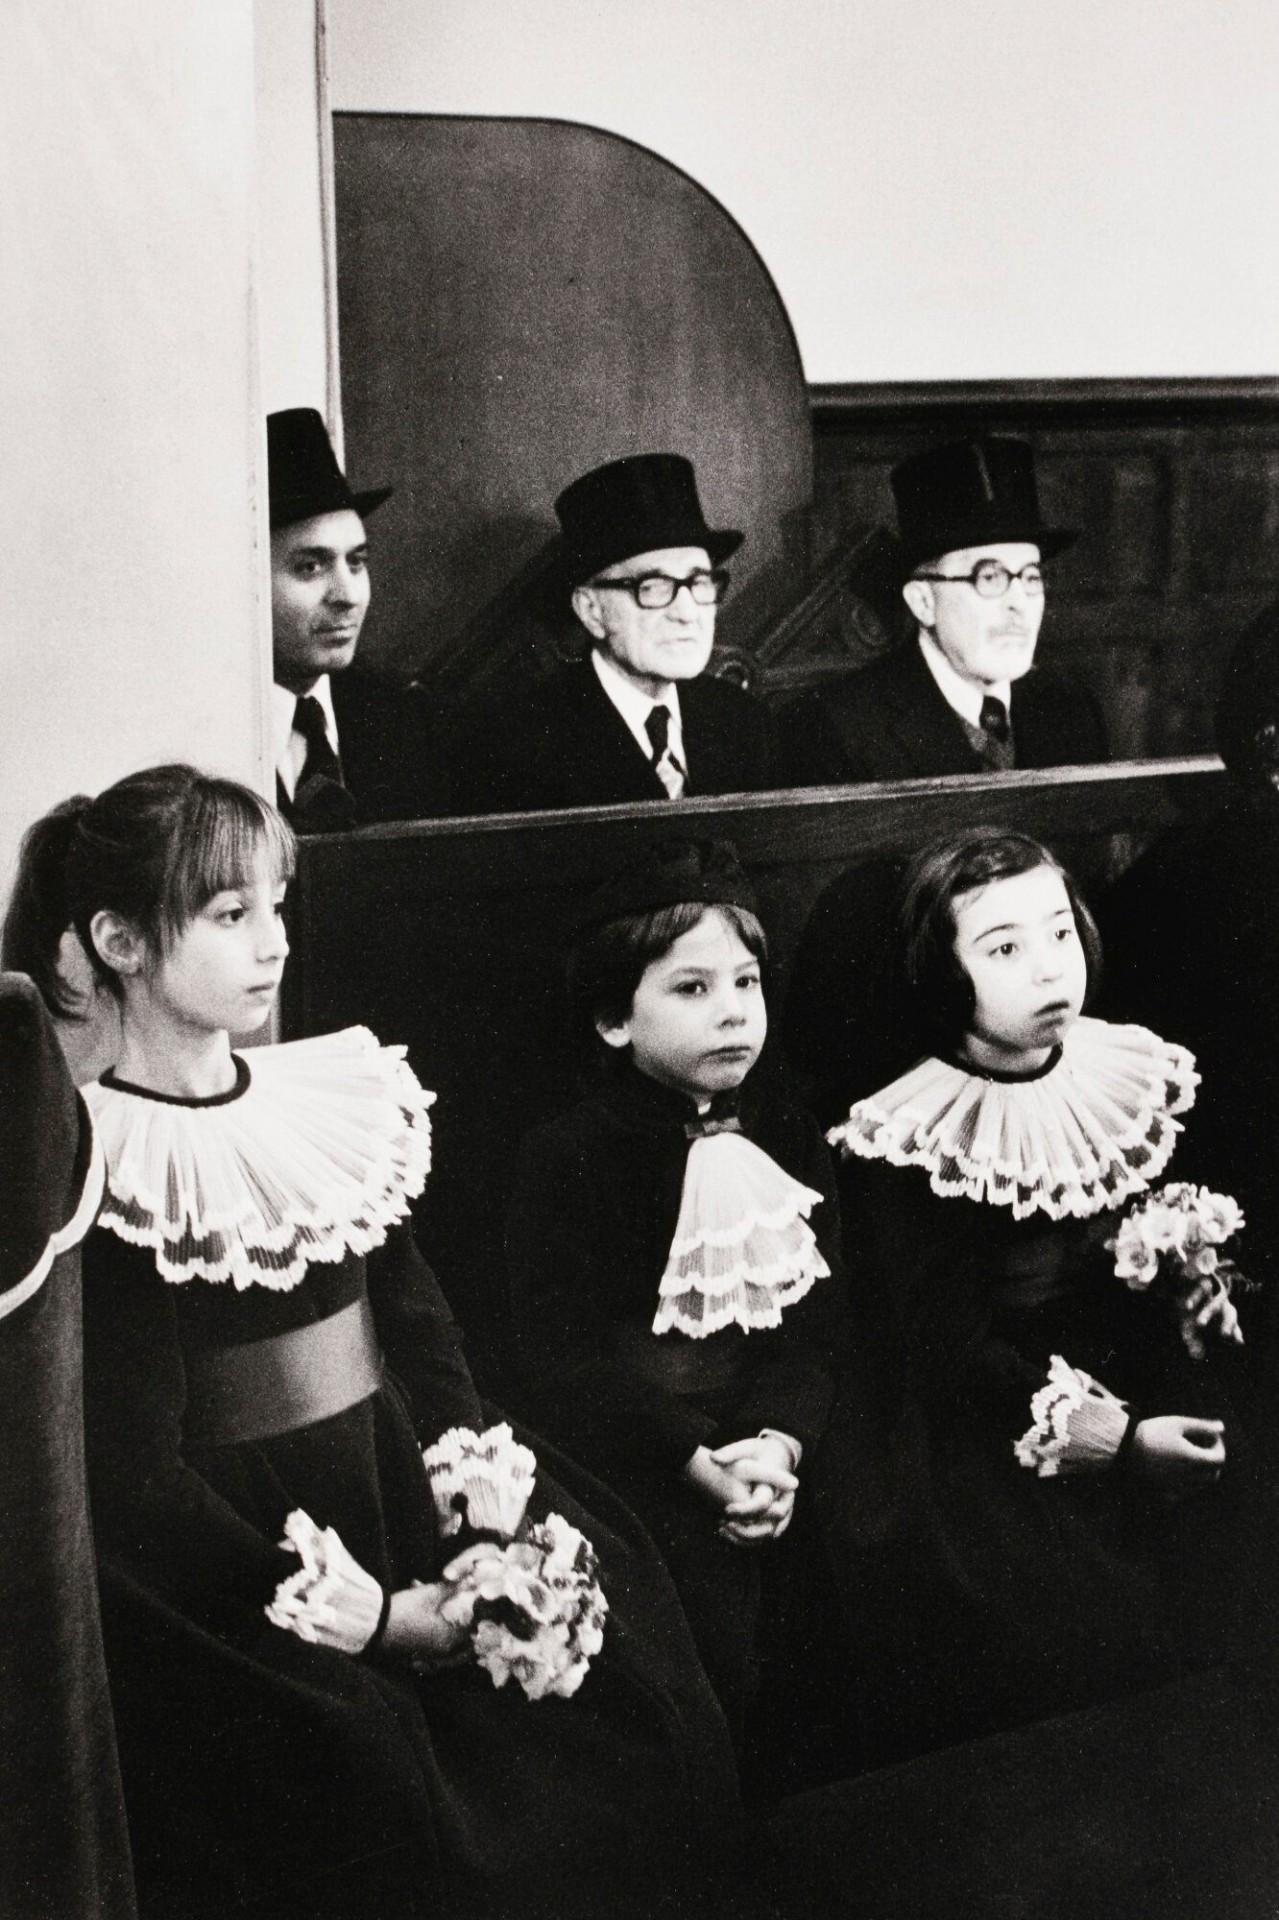 Свадьба в синагоге, 1977. Фотограф Мартина Франк